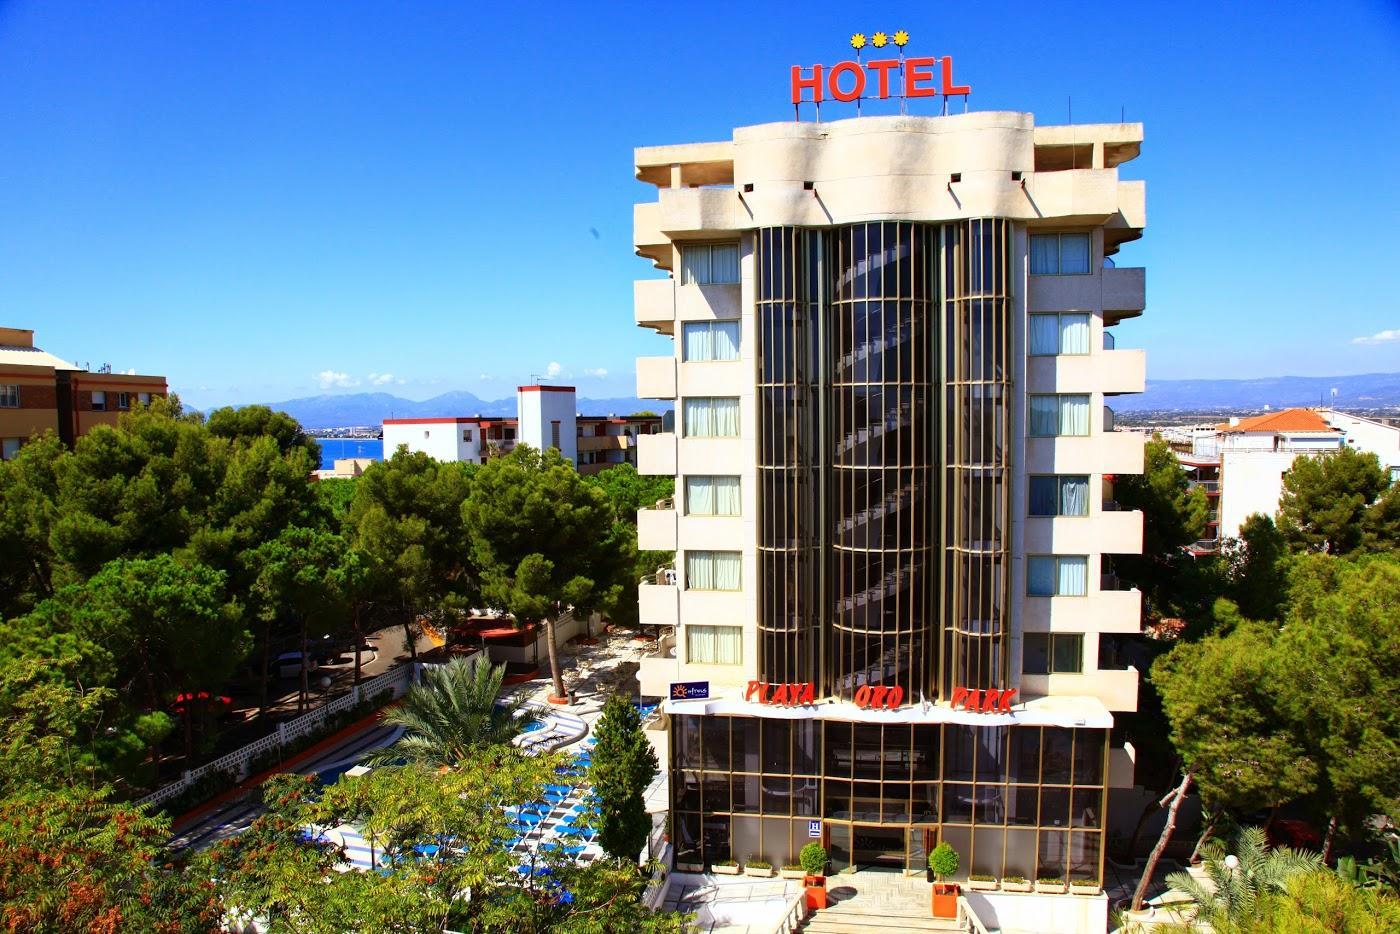 Ohtels Playa De Oro Hotel 30*